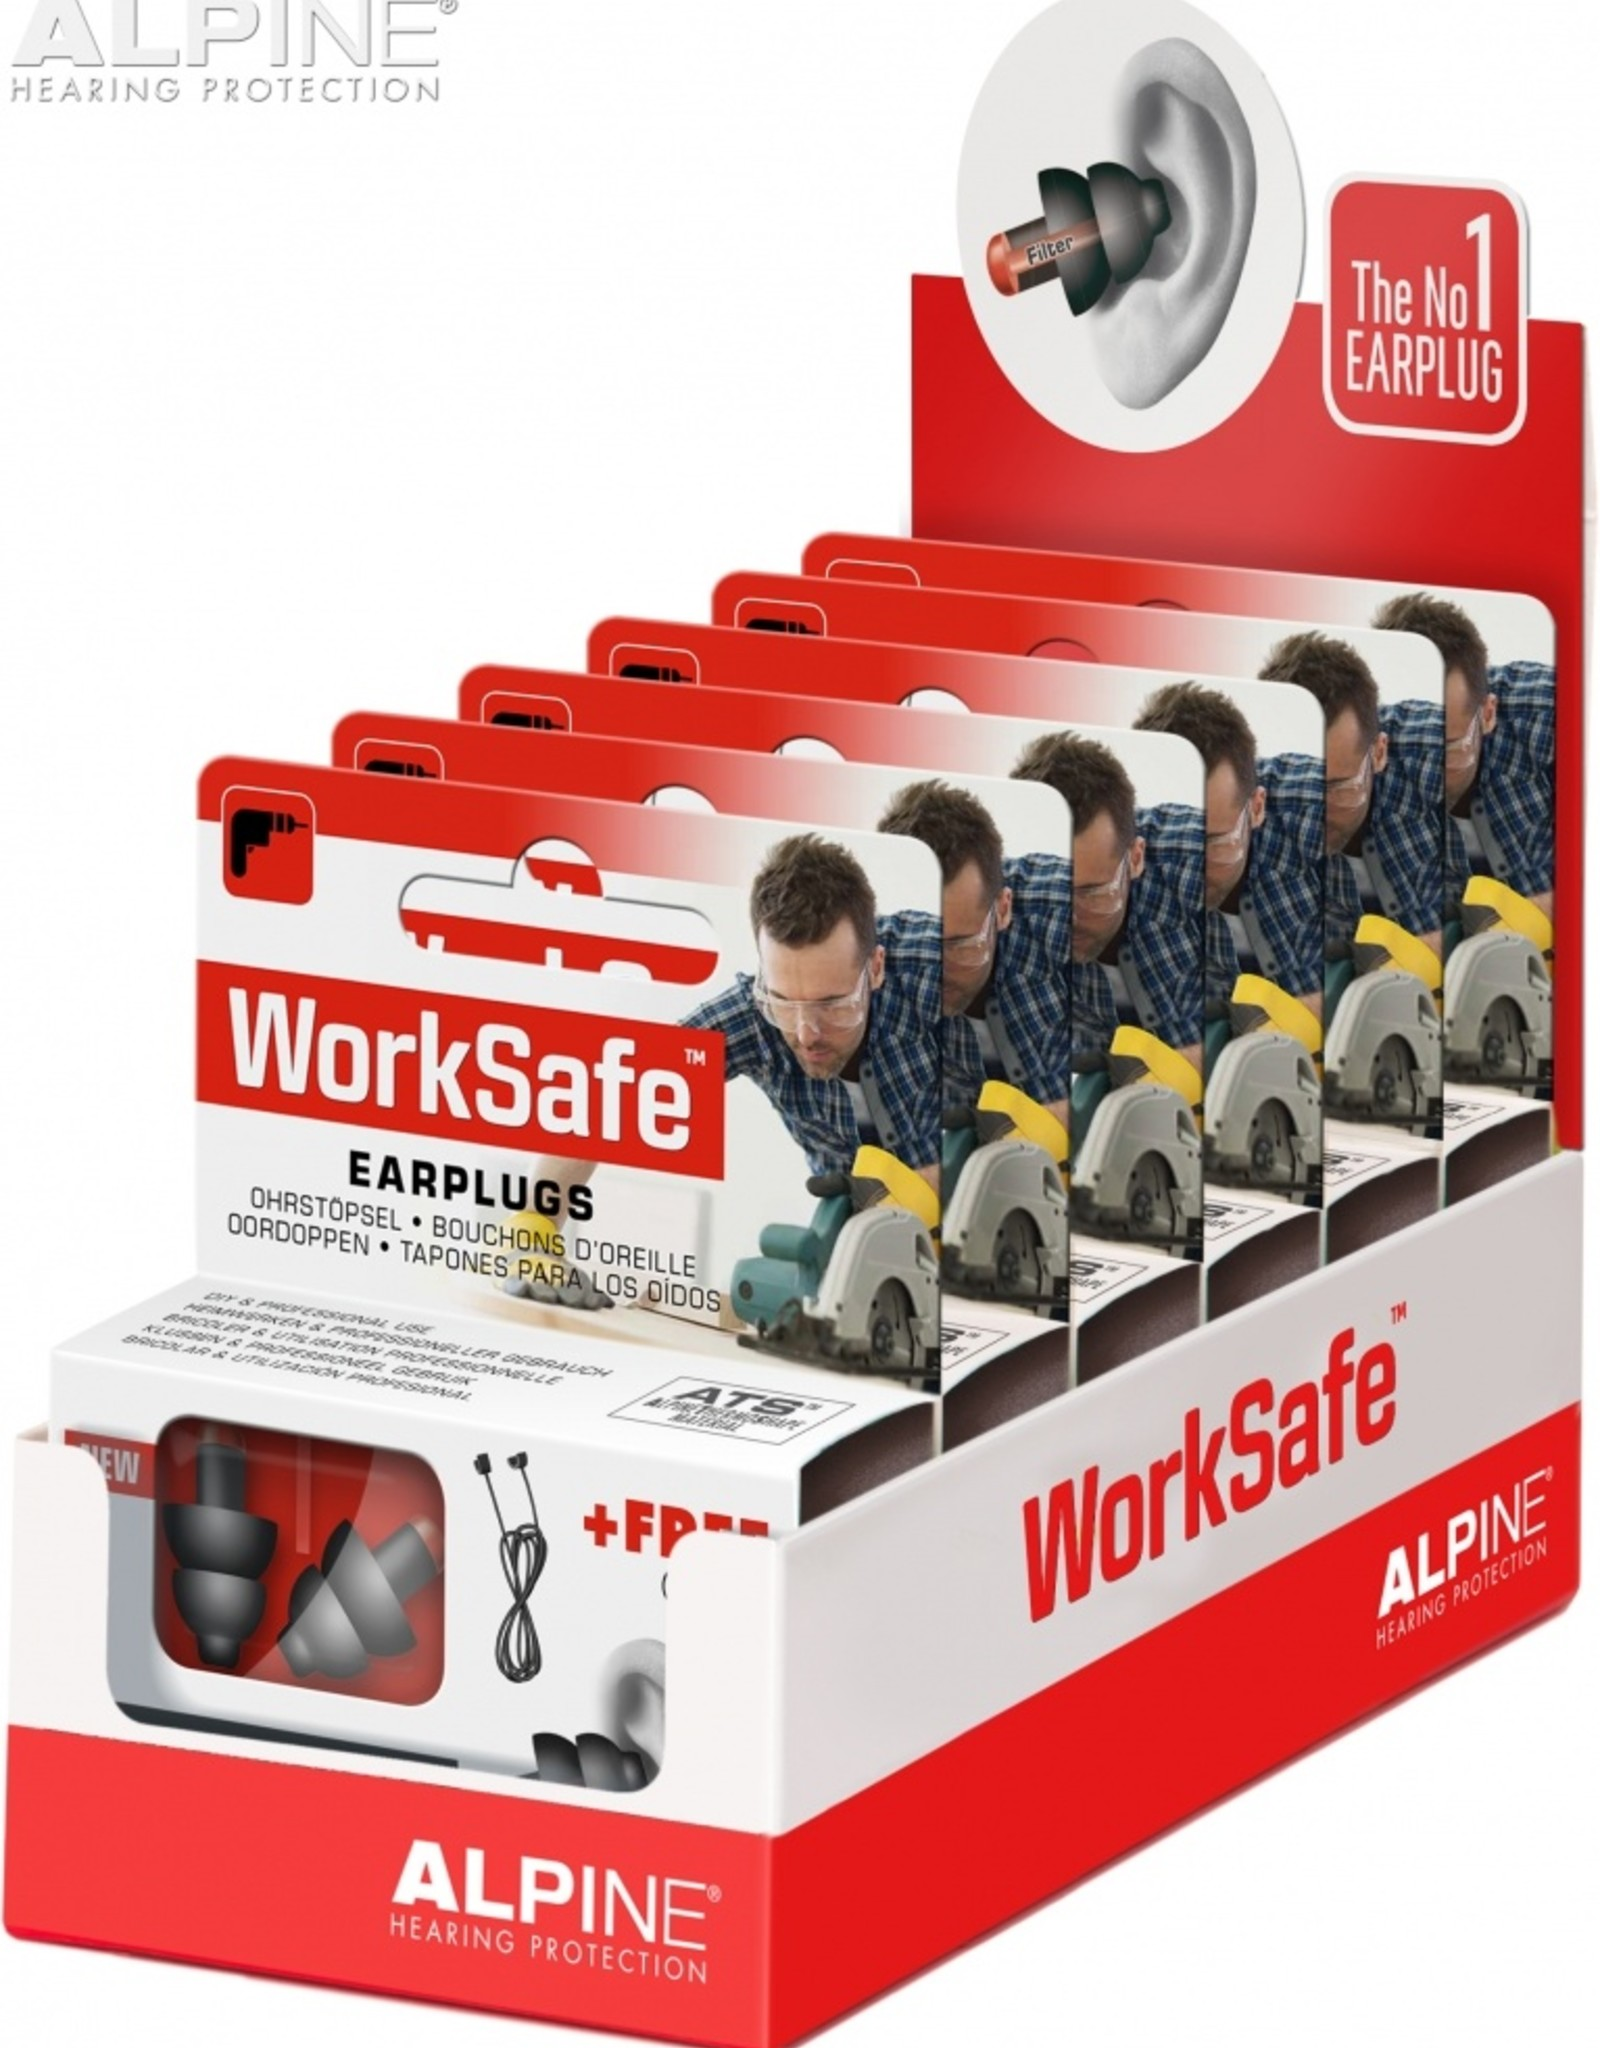 Alpine WorkSafe display